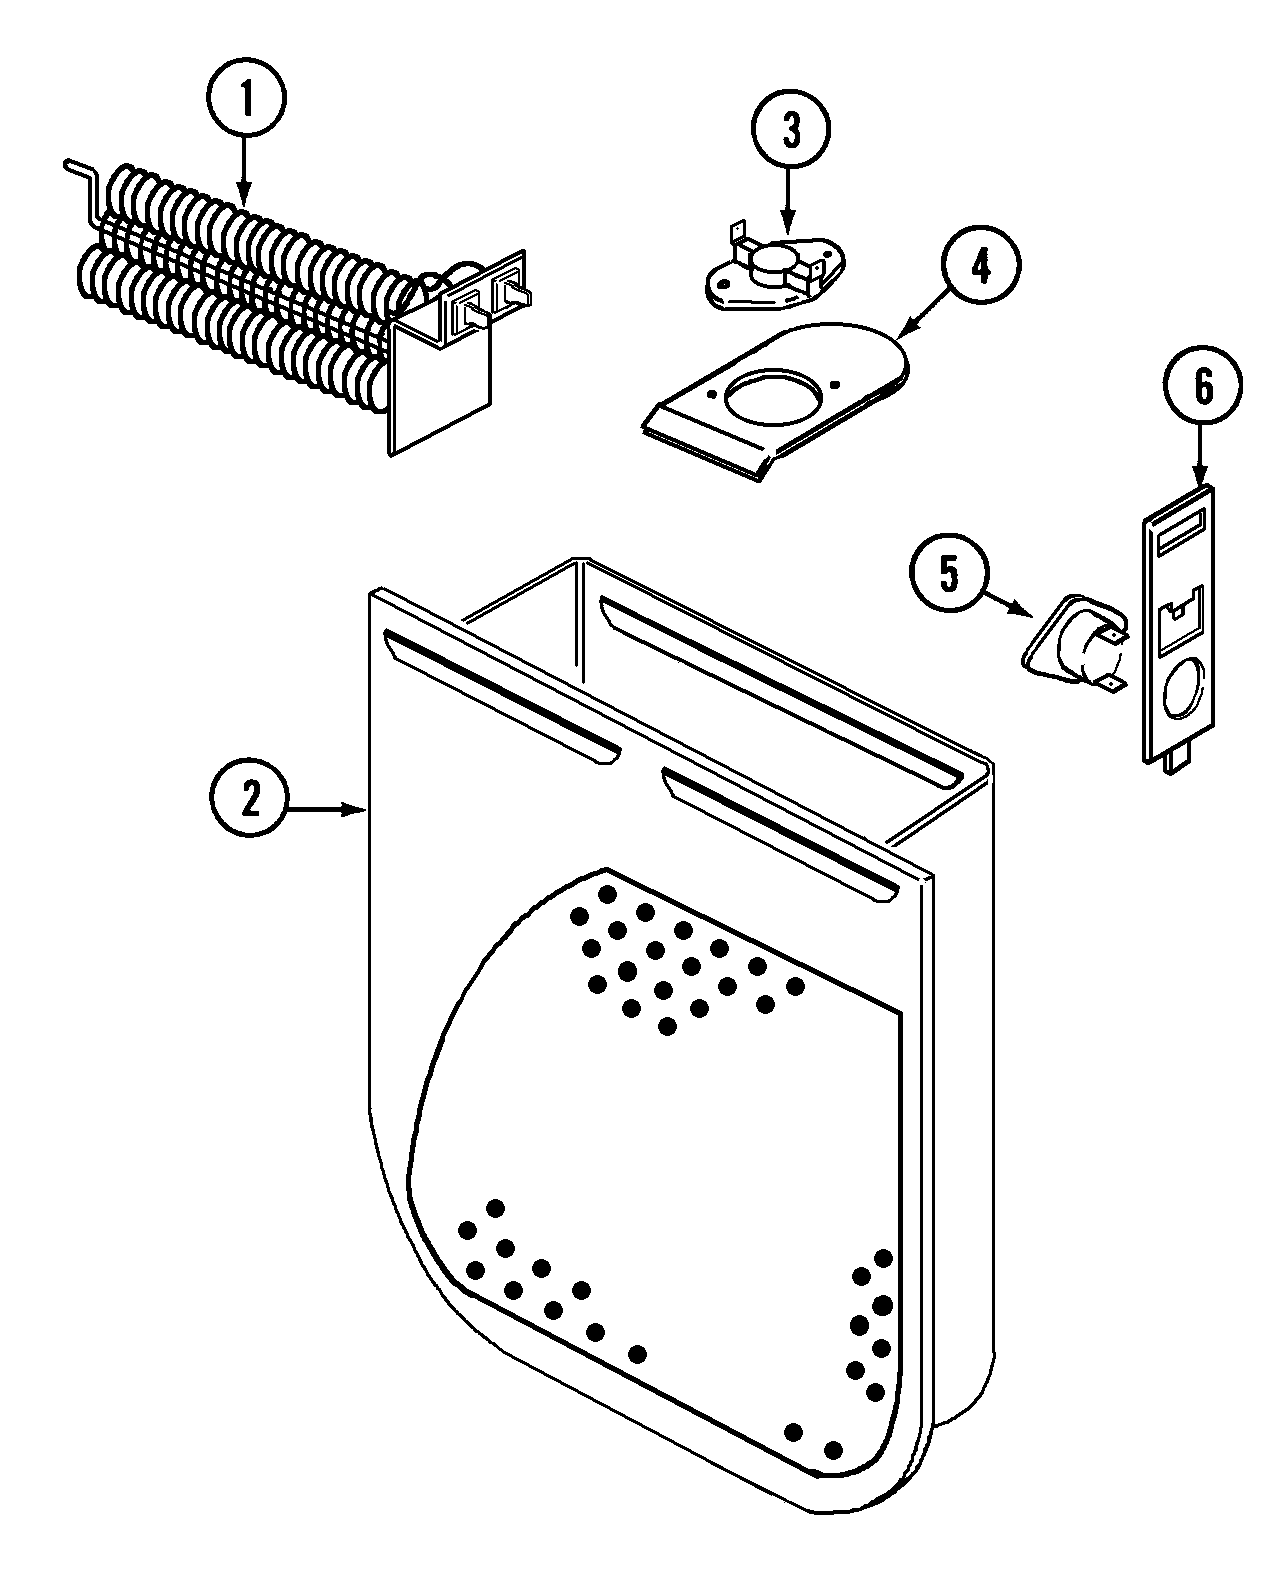 Maytag Performa Dryer won't heat up